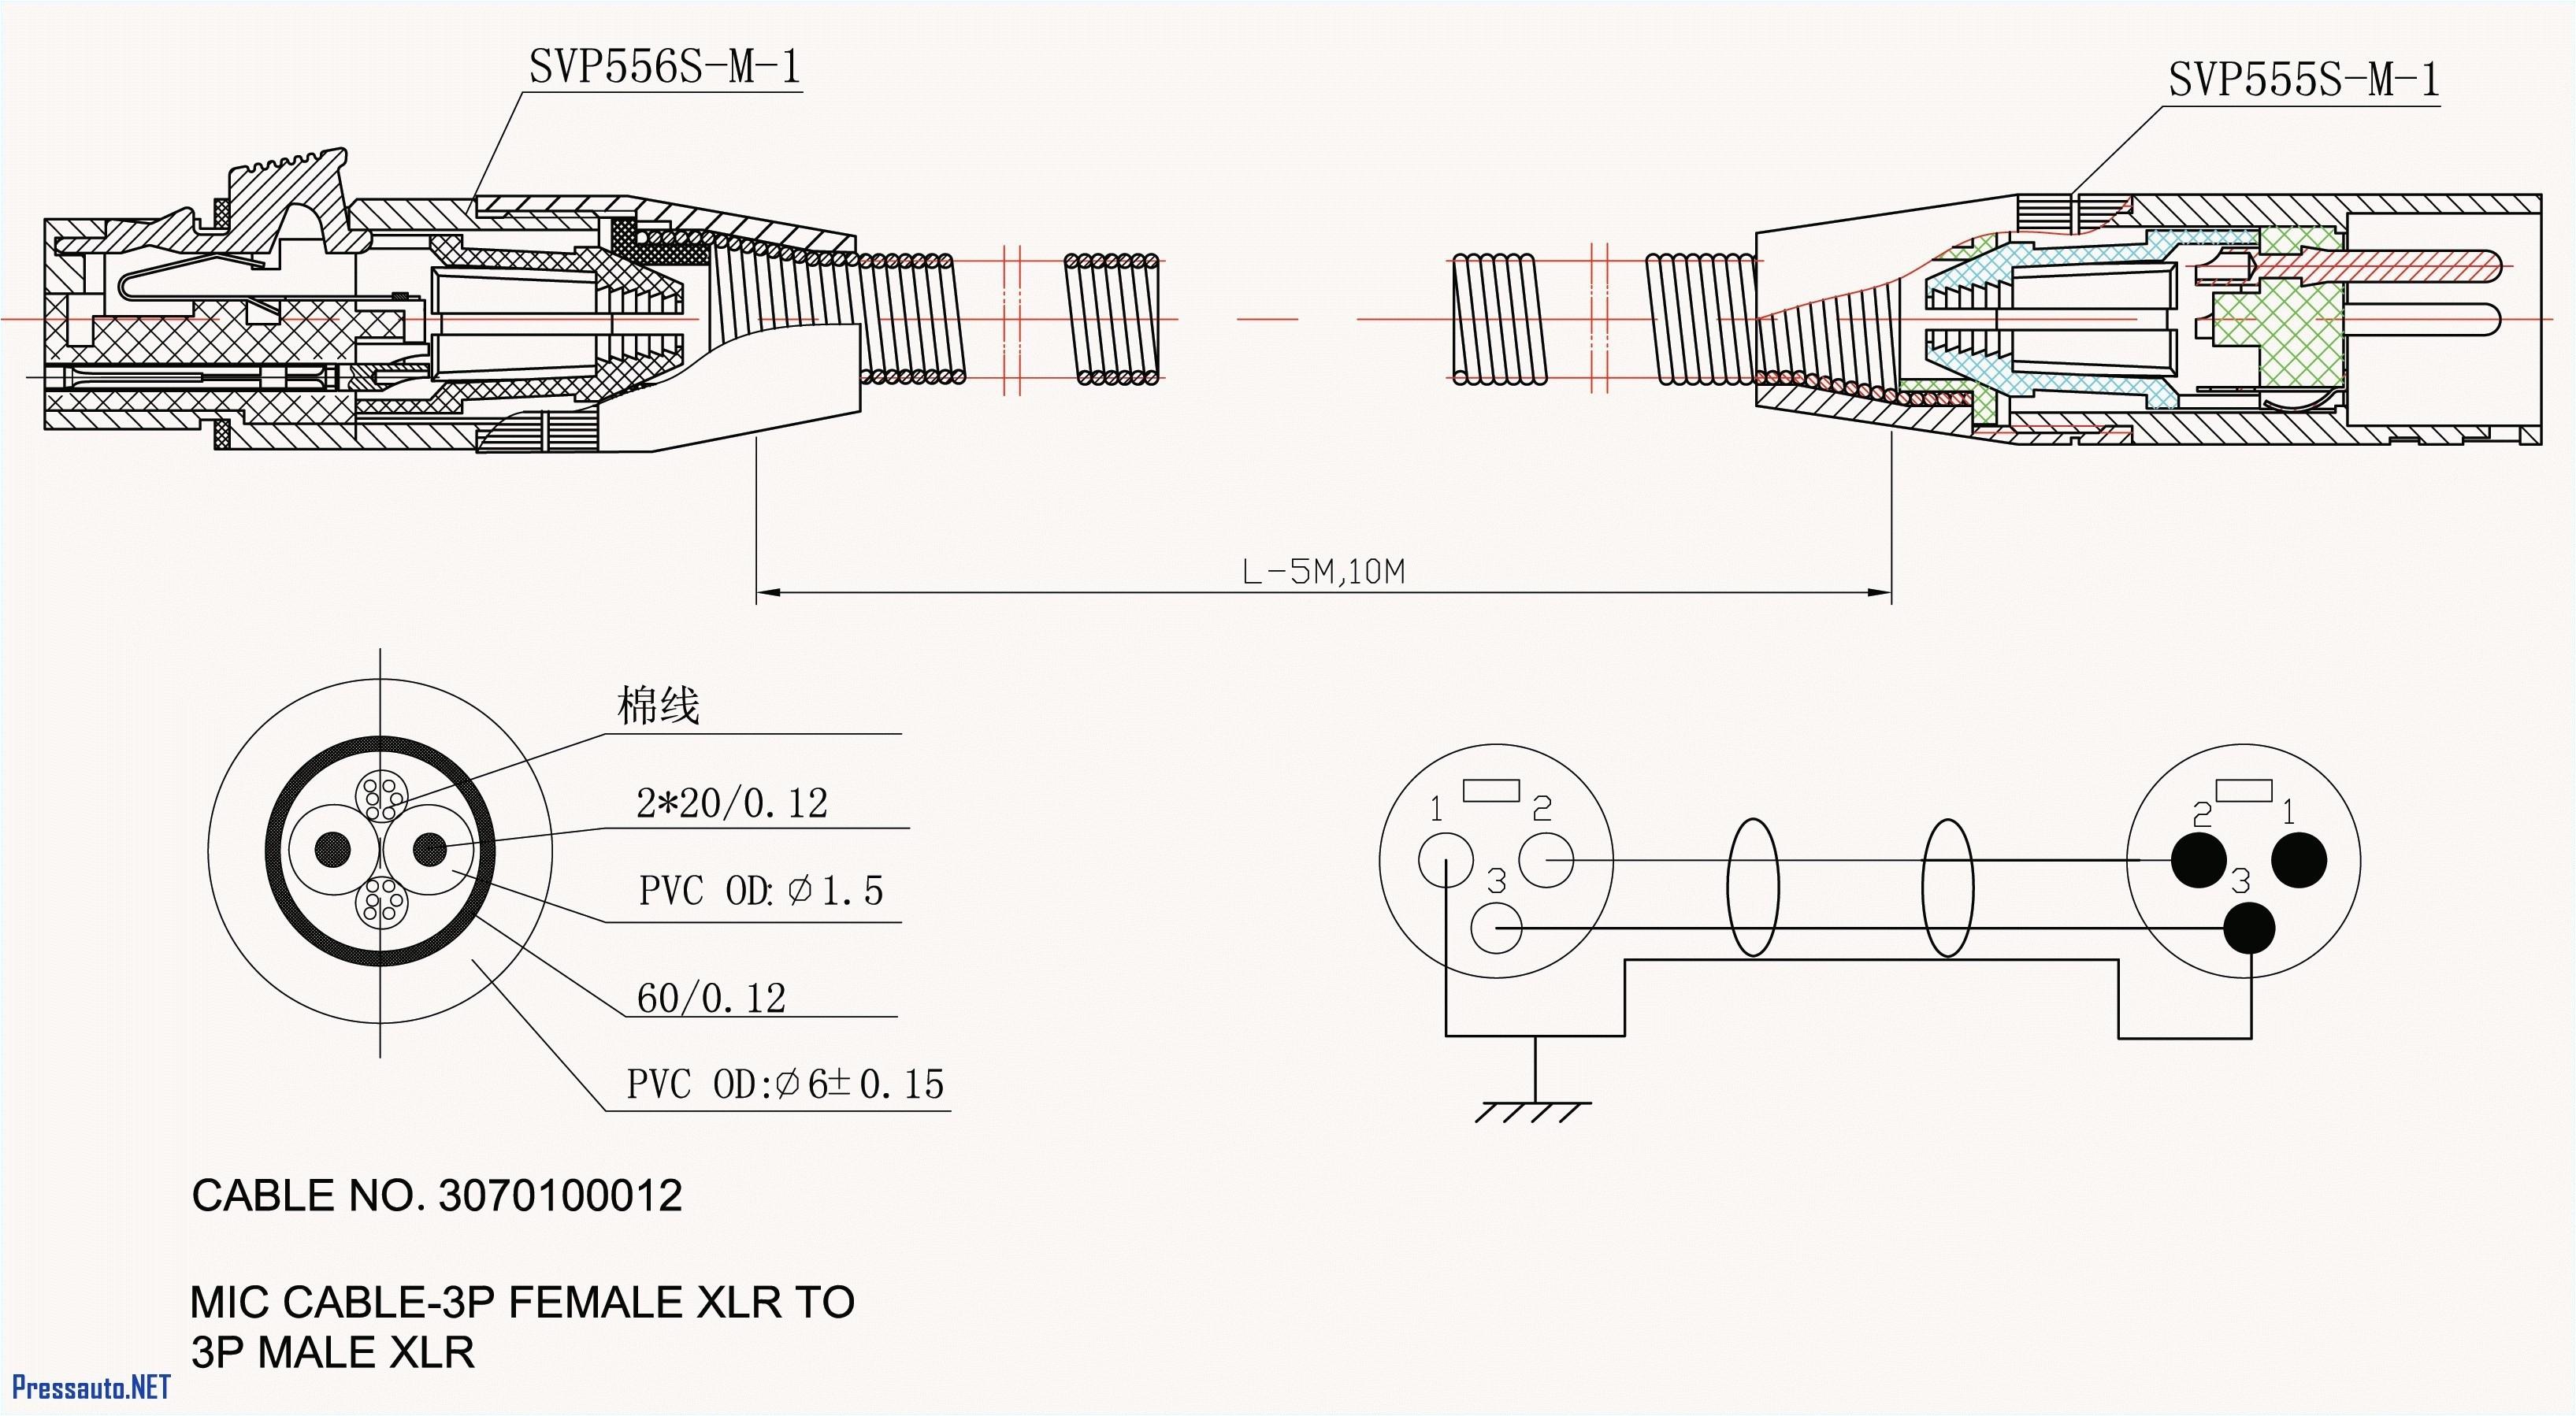 mando marine alternator wiring diagram wiring diagram mix mercruiser alternator wiring diagram parts save omc new